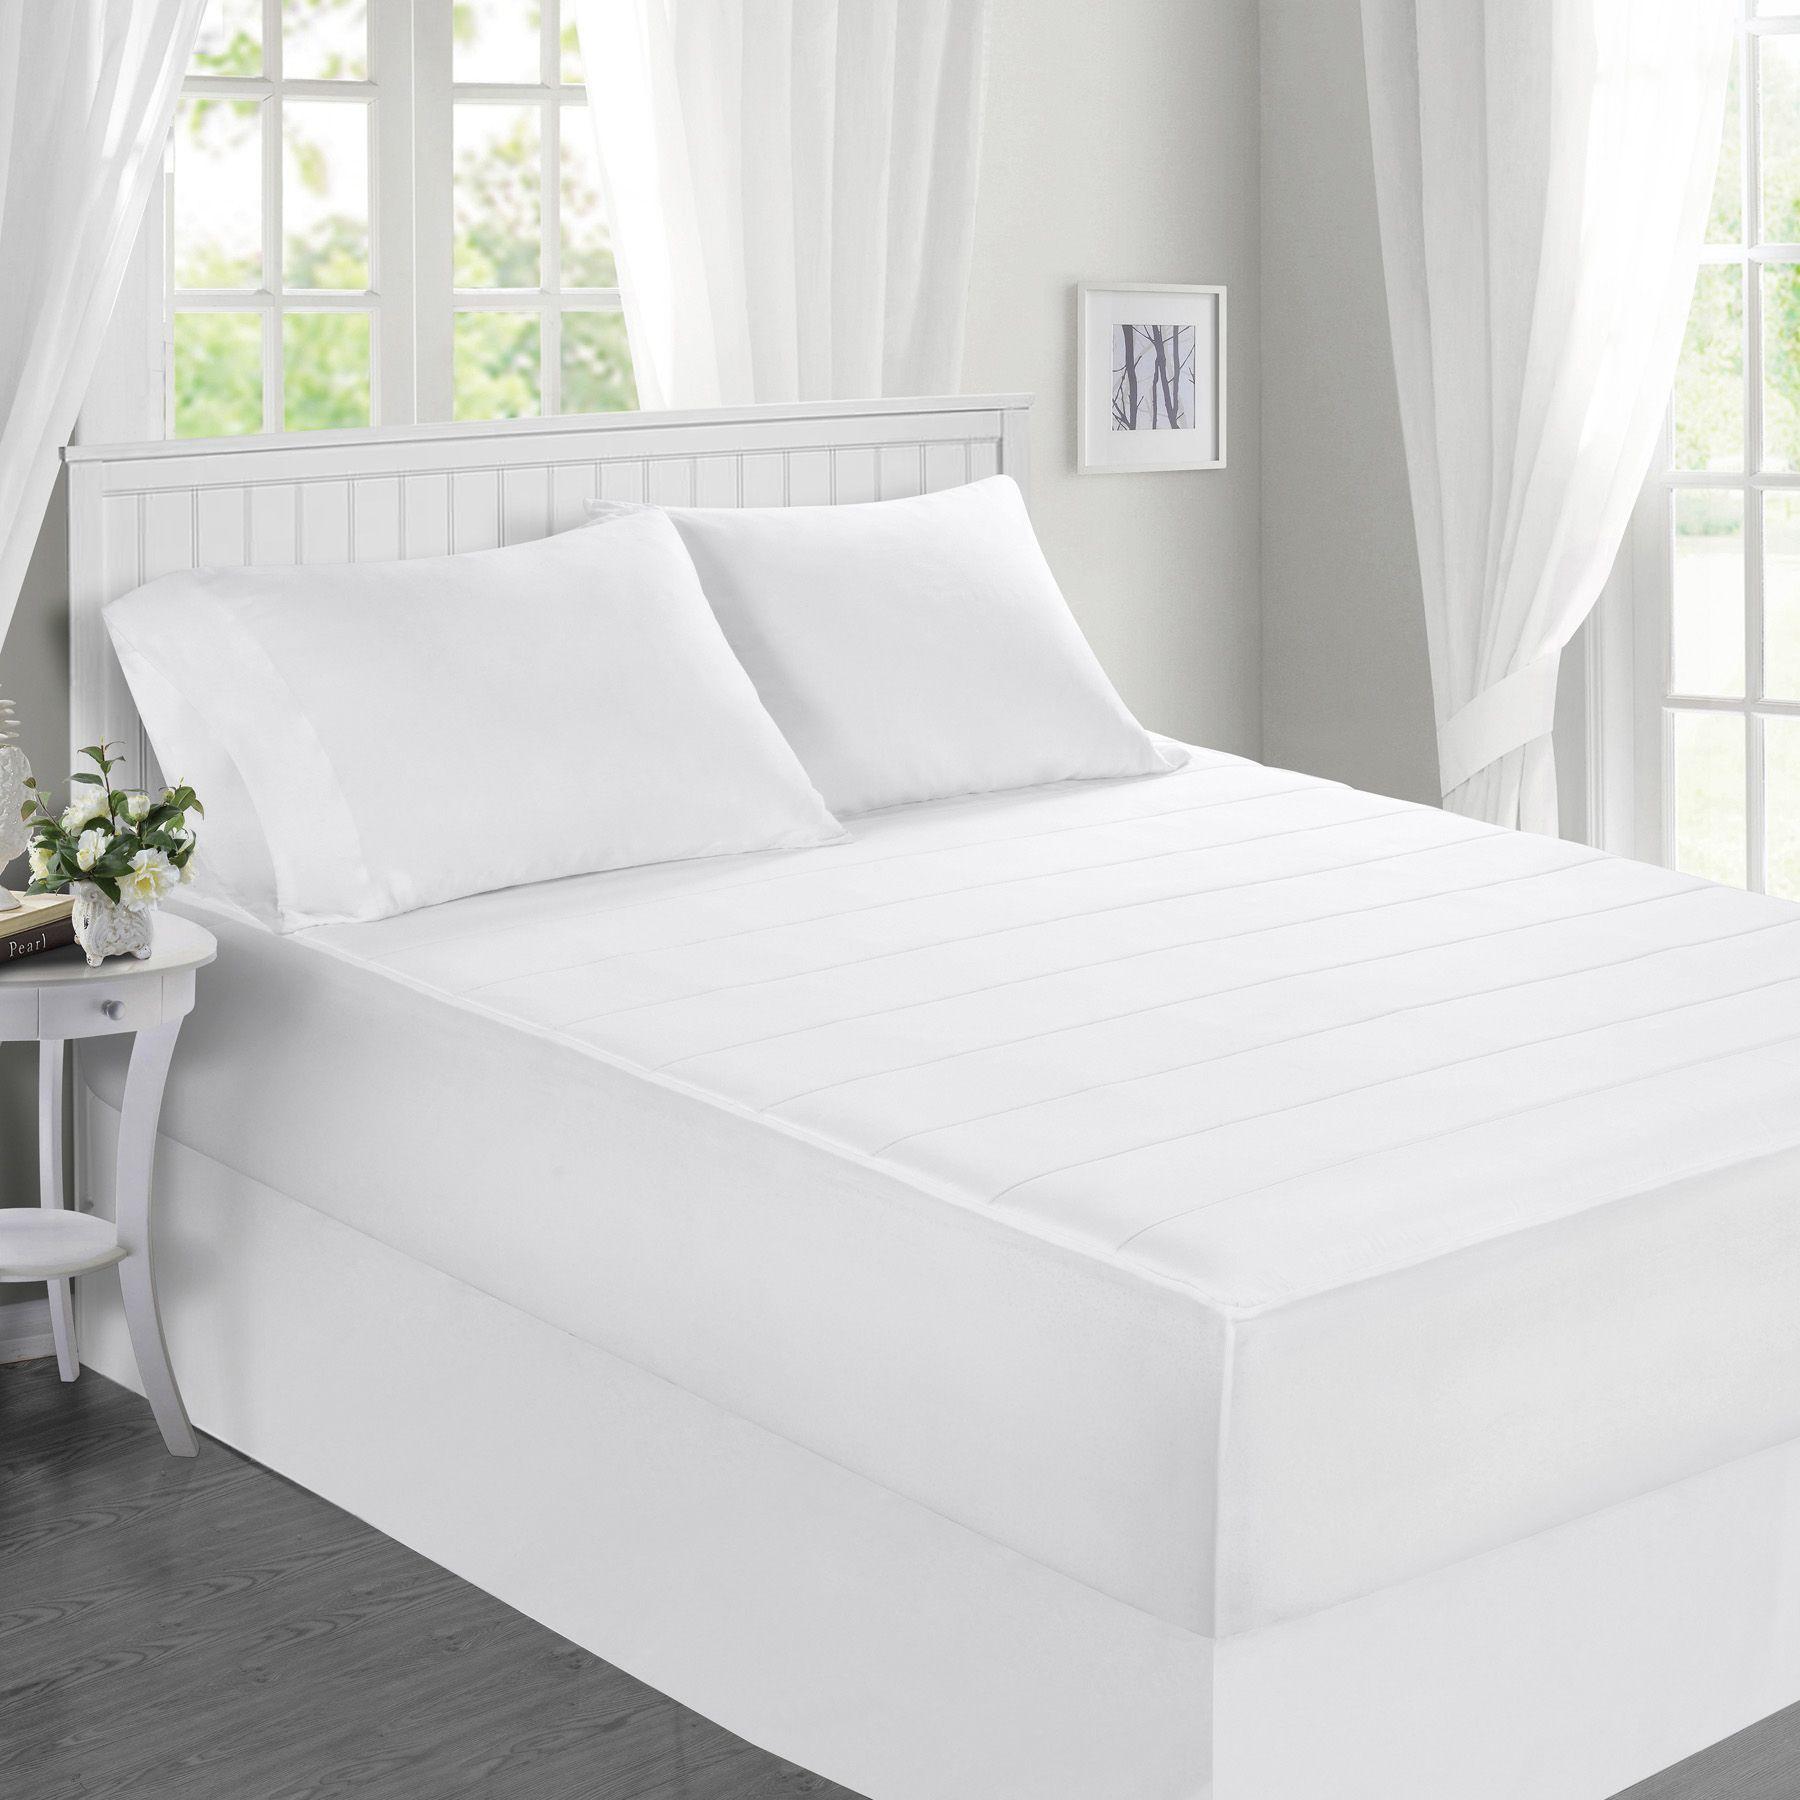 Fingerhut - McLeland Design Memory Foam Mattress Pad | Bedroom ...